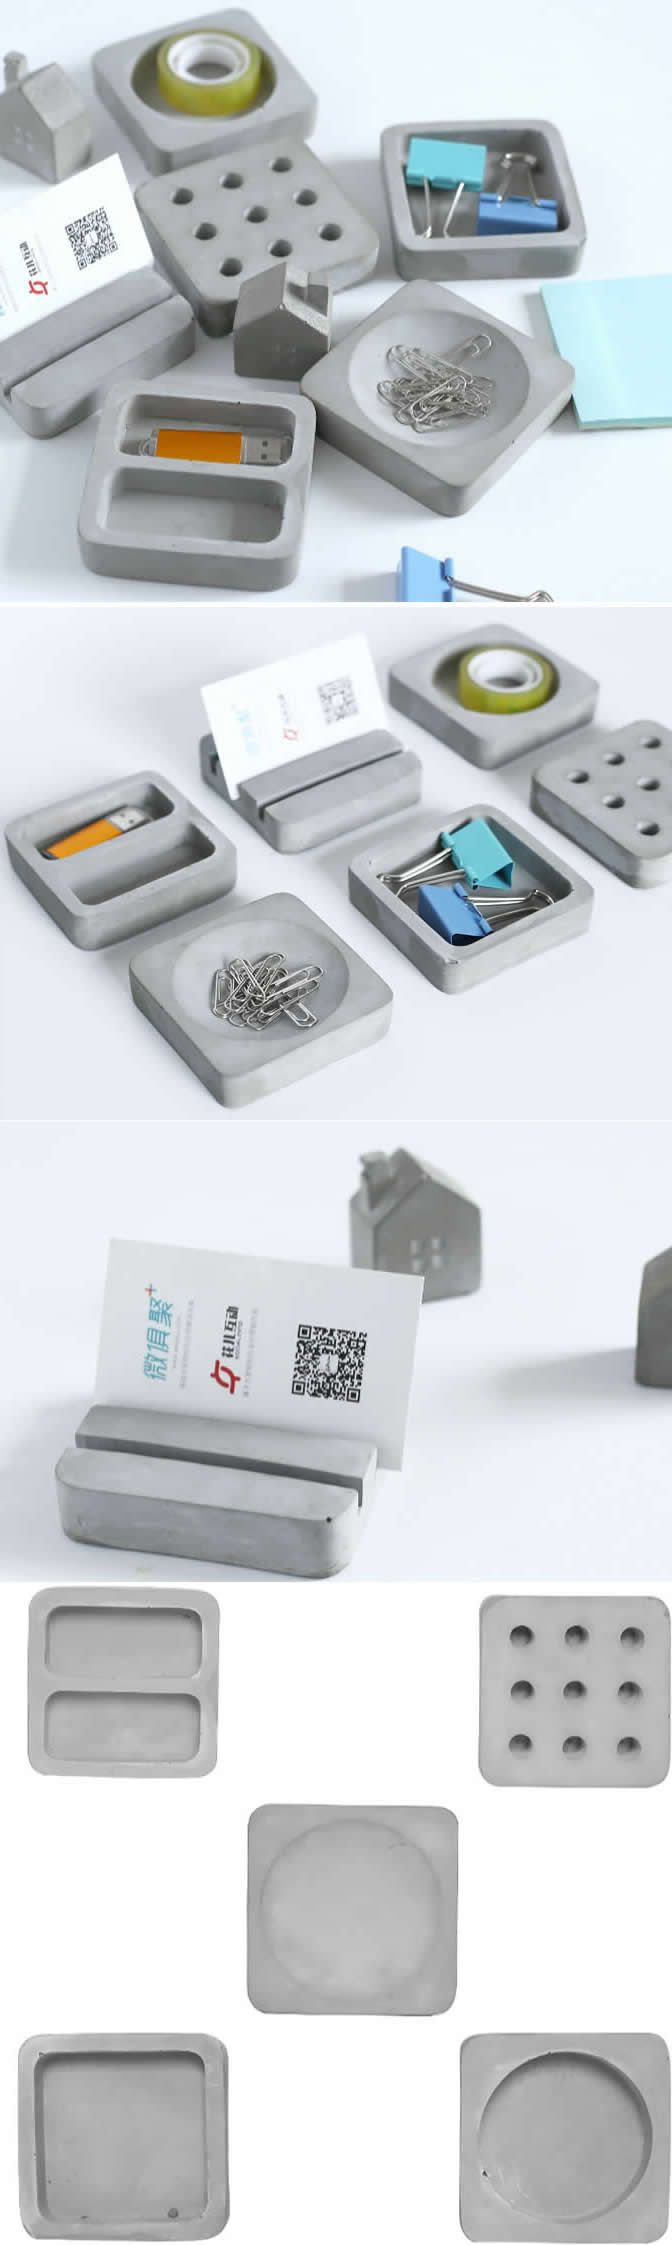 Concrete Modular Desk Stationery Organizer Smart Phone Dock Stand Holder Business Card Holder